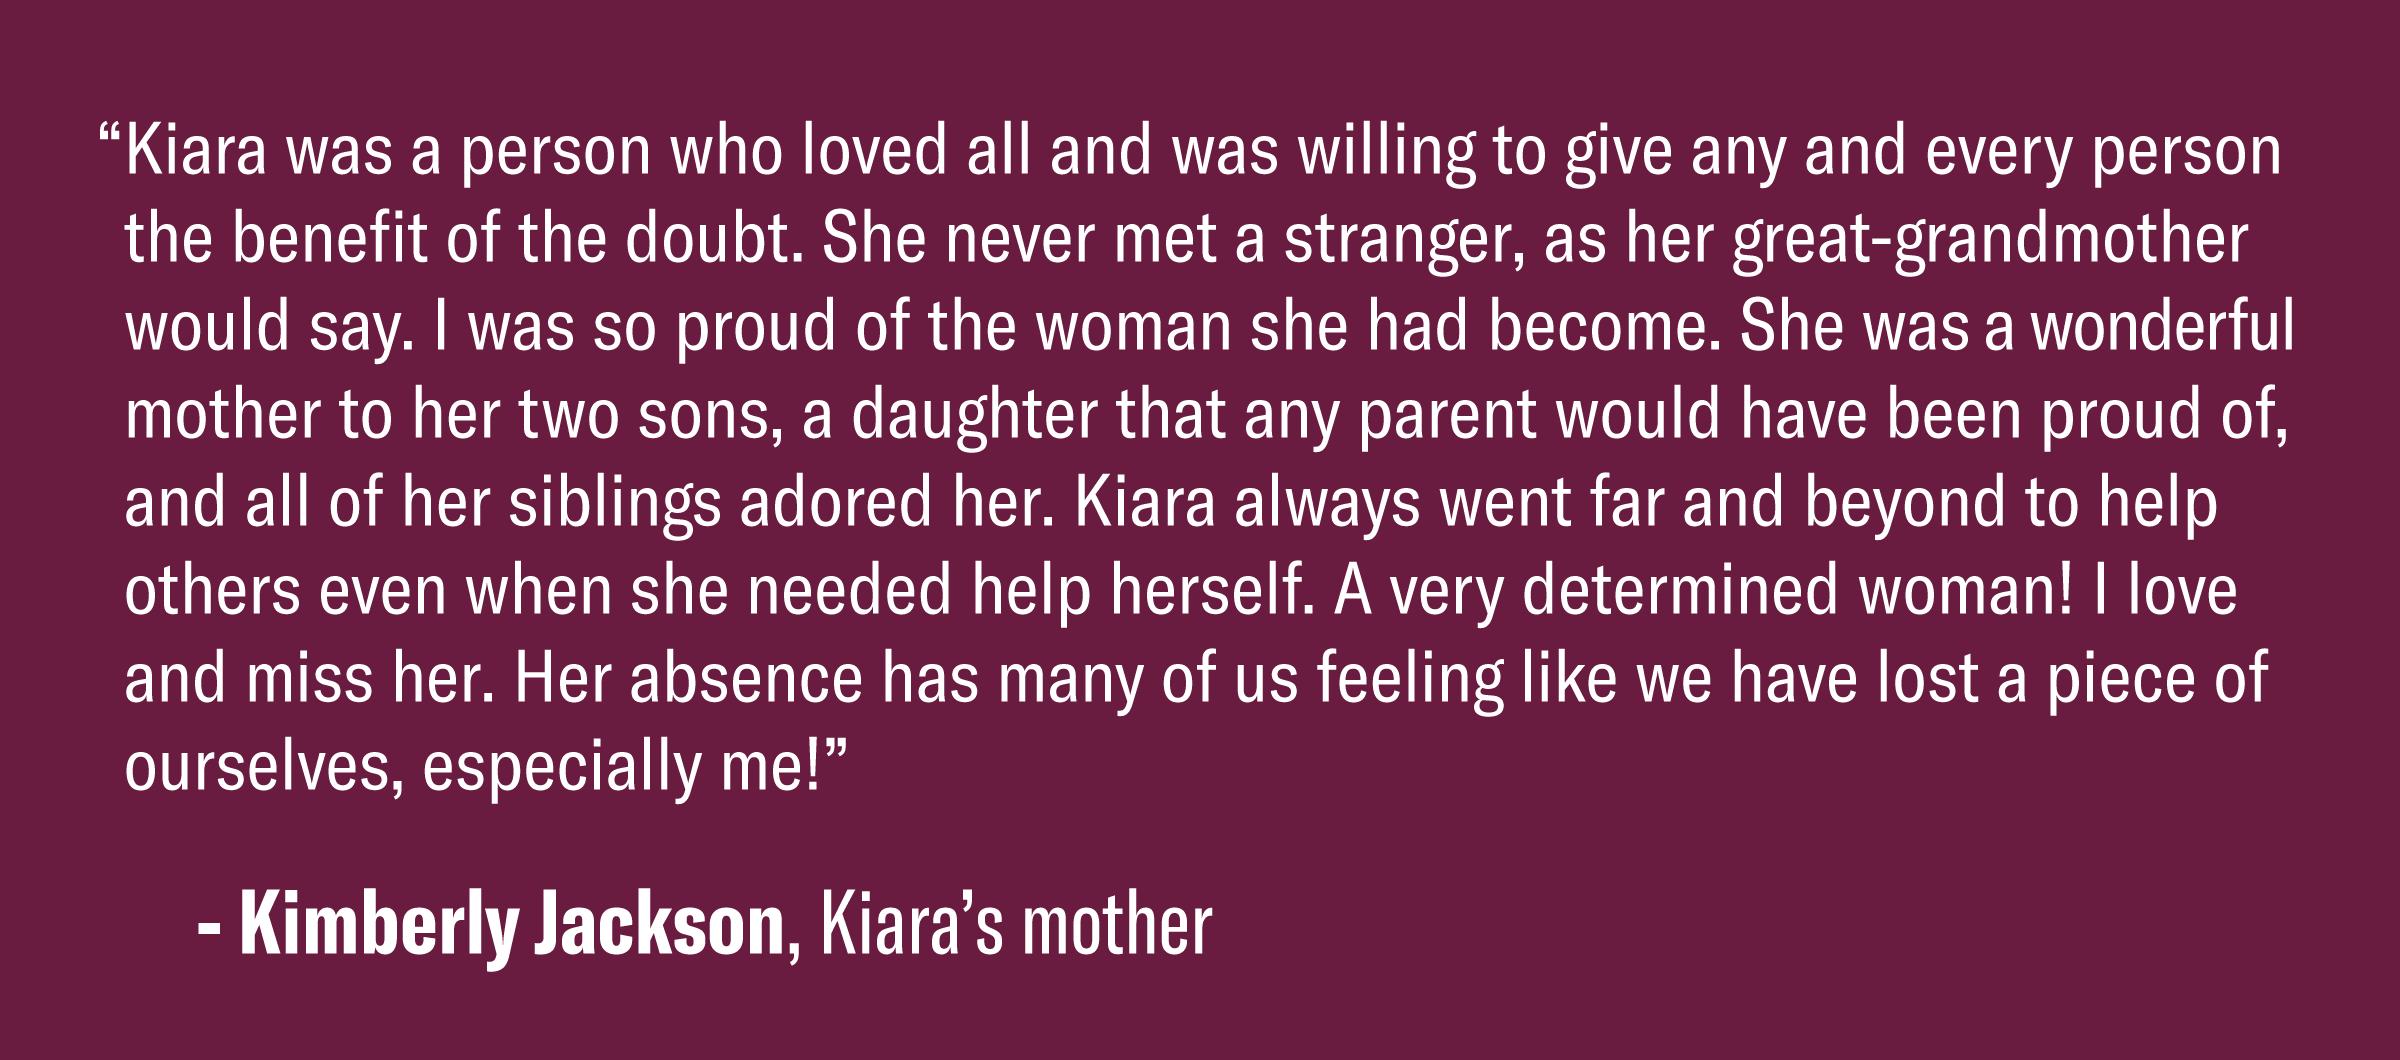 Quote from Kimberly Jackson Kiara's mother